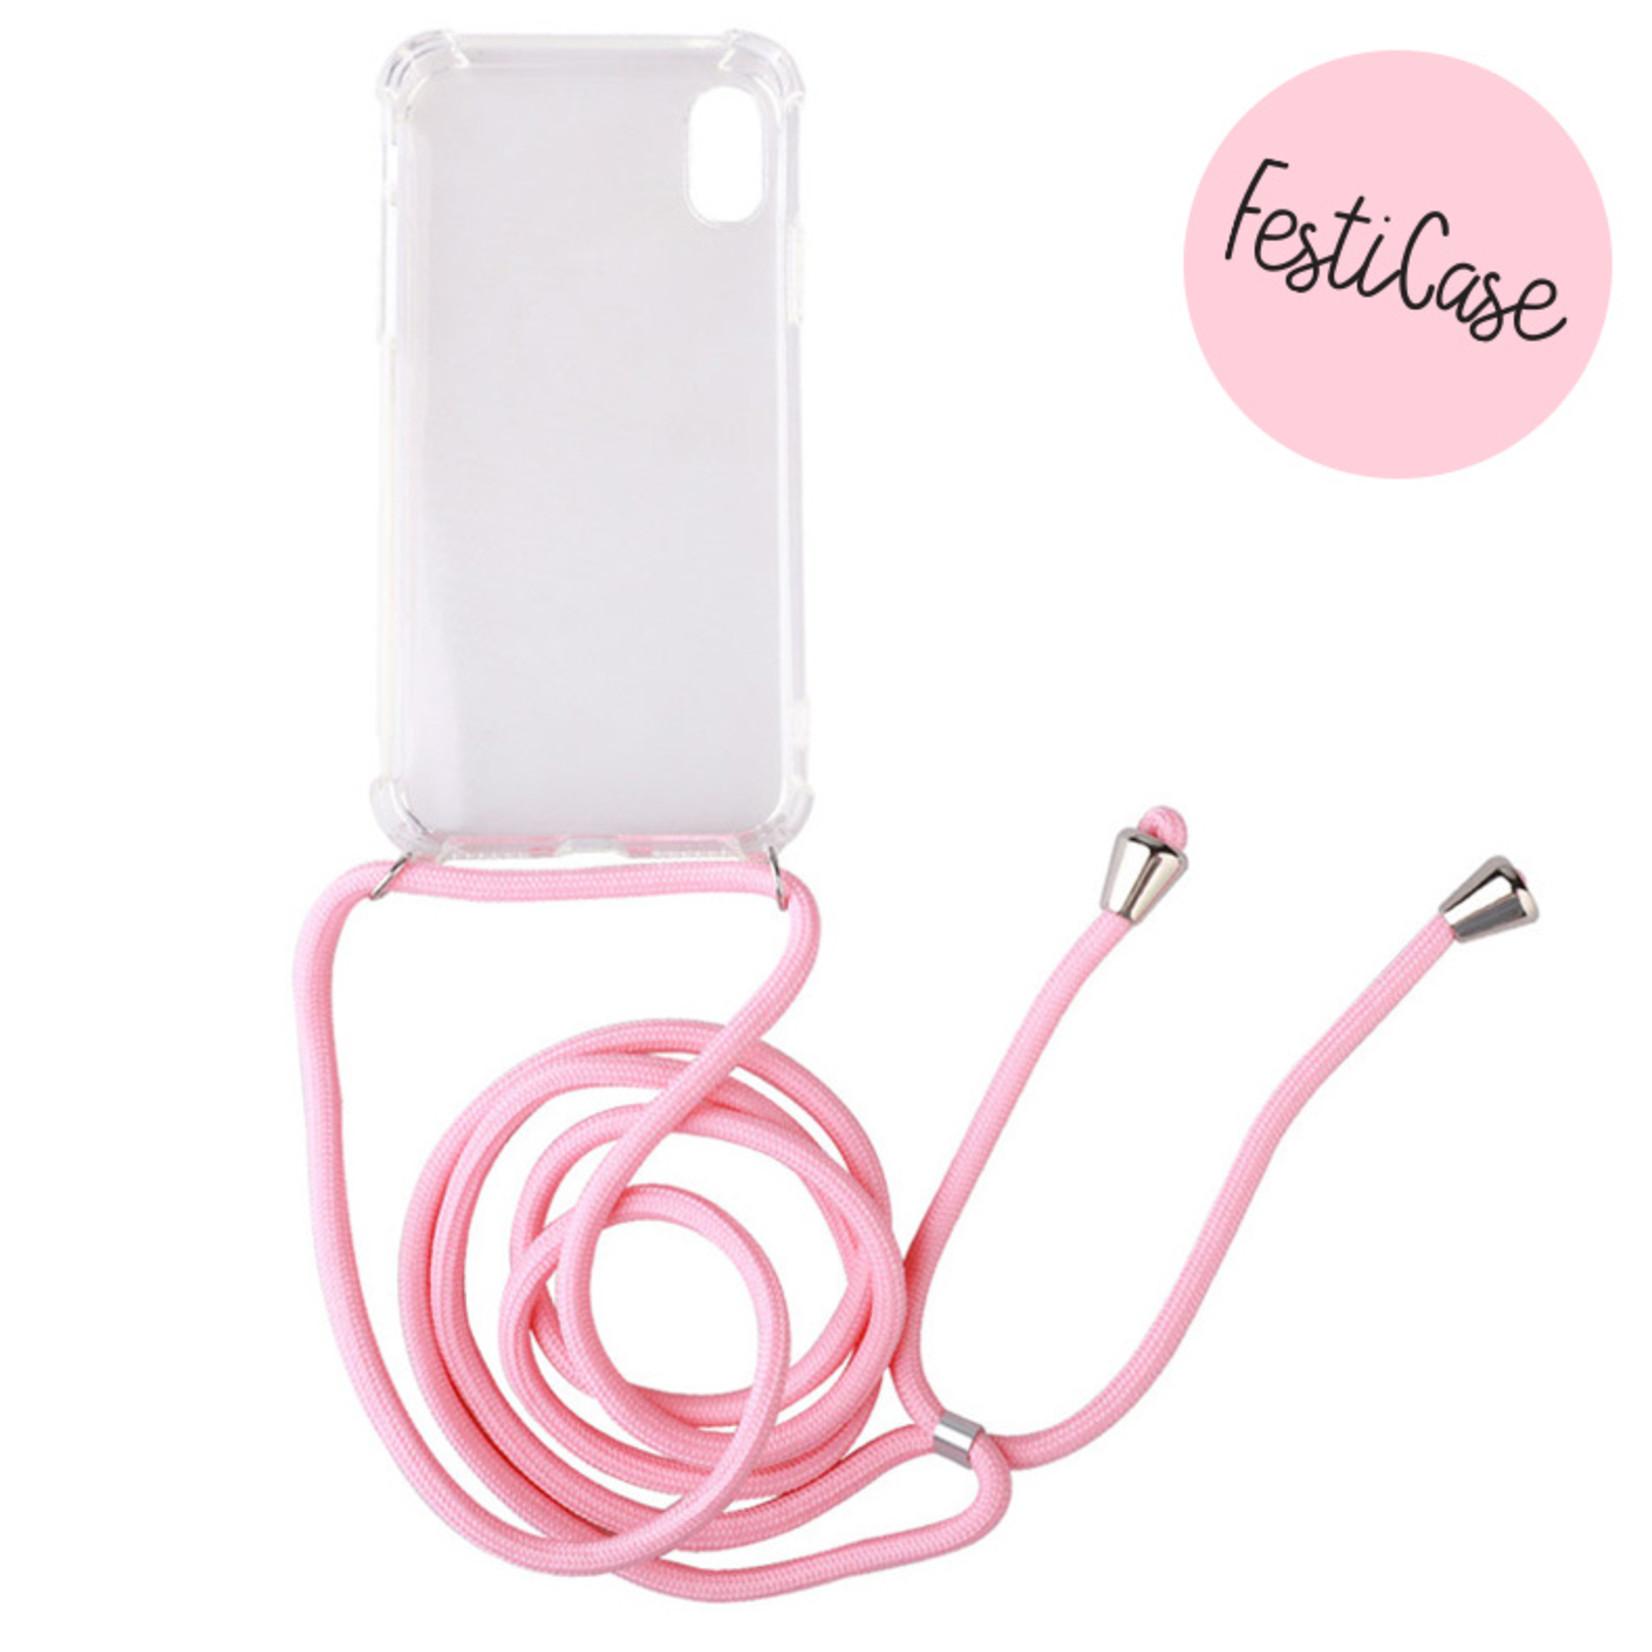 FOONCASE FESTICASE iPhone XS Max Telefoonhoesje met koord (Roze) TPU Soft Case - Transparant